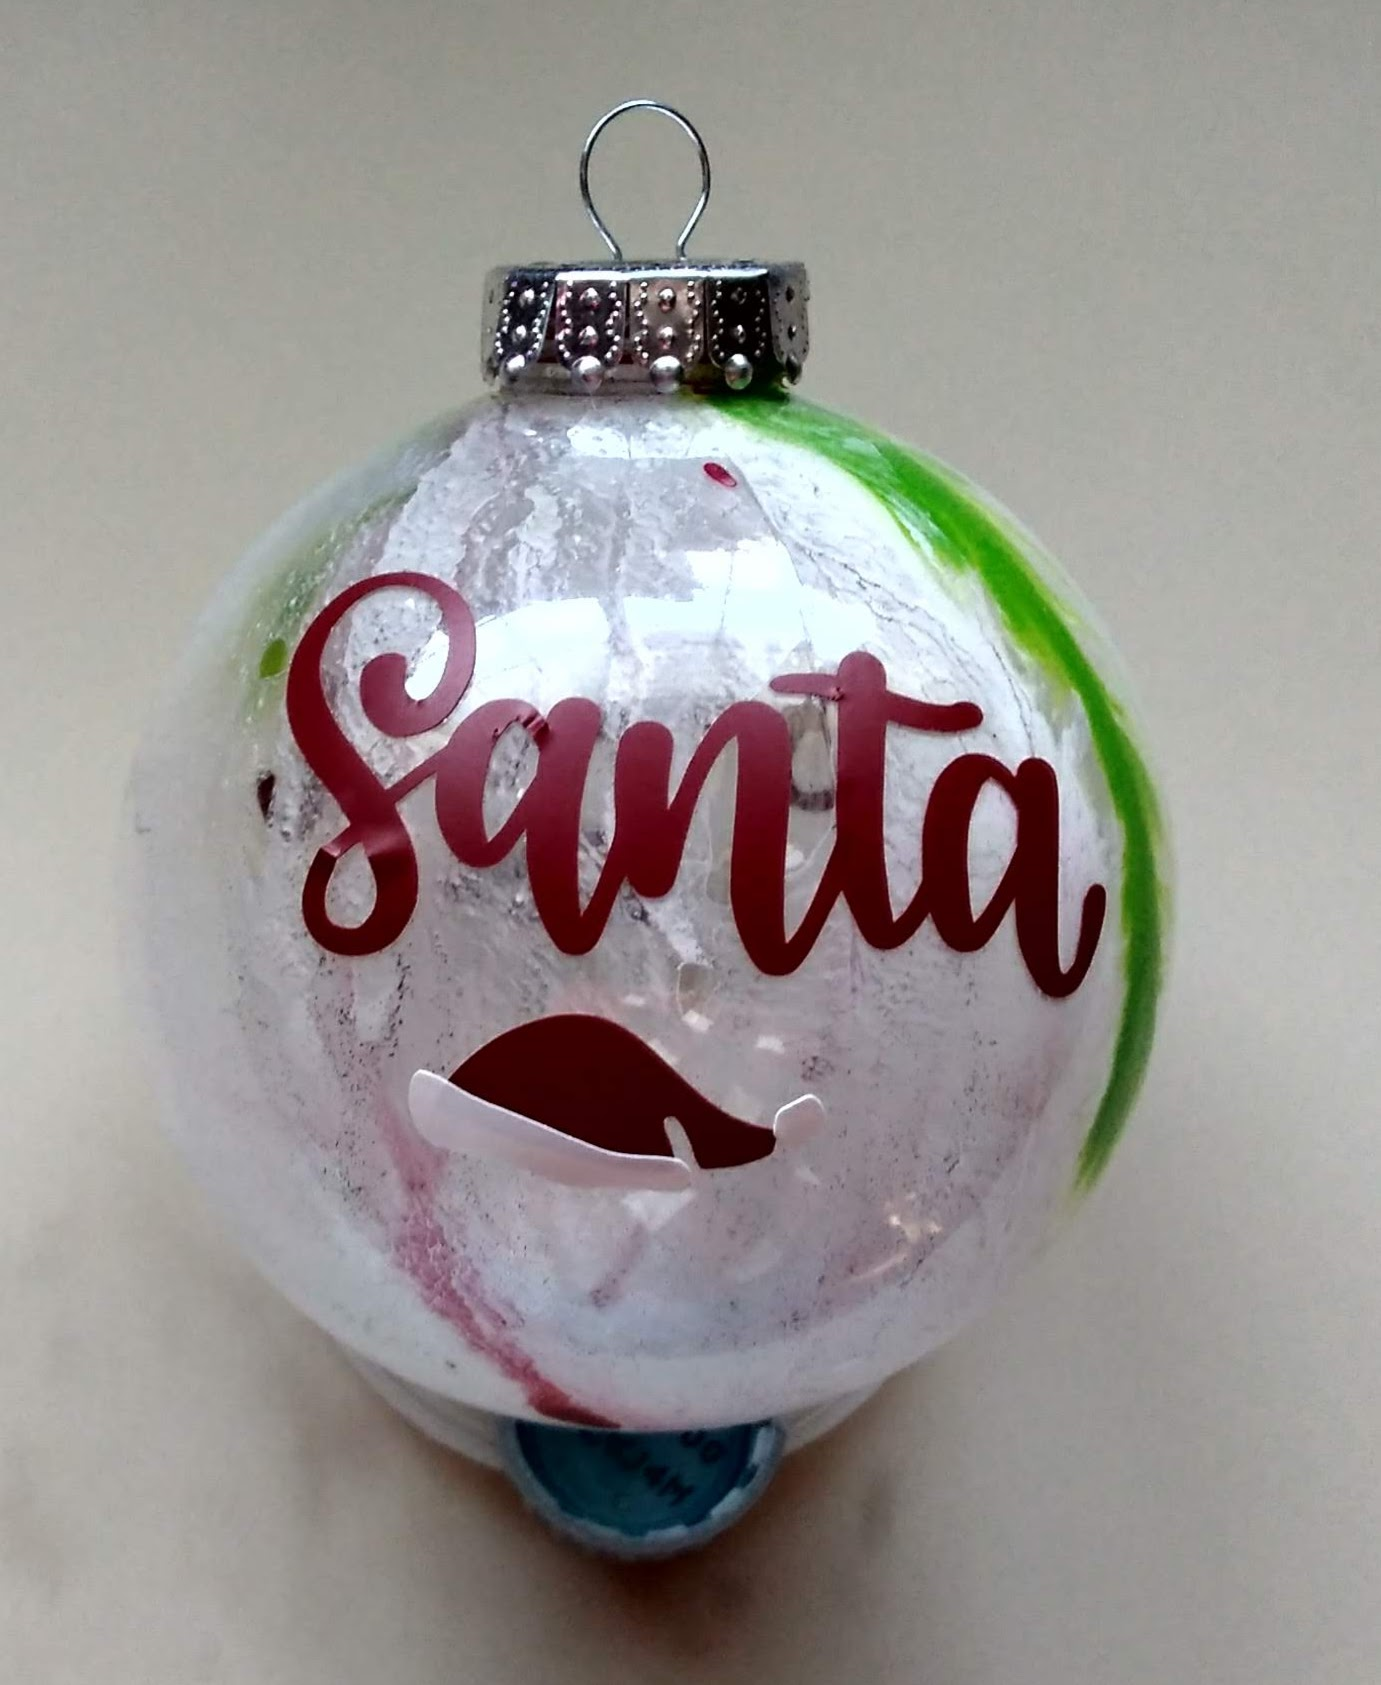 Homemade Bulb Paint Ornaments